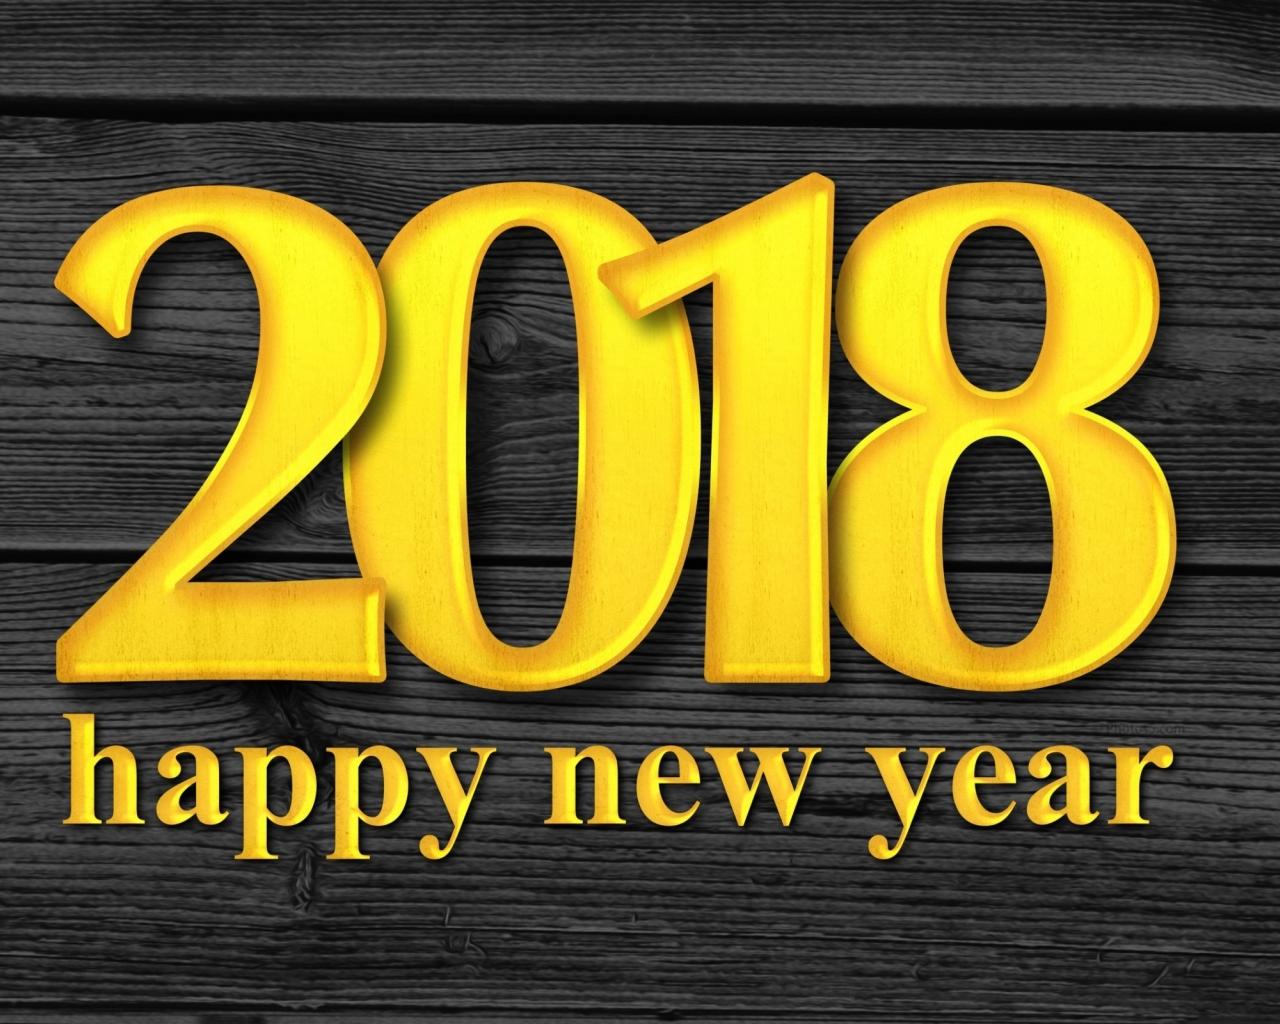 1280x1024 New Year 2018 Happy New Year 1280x1024 Resolution